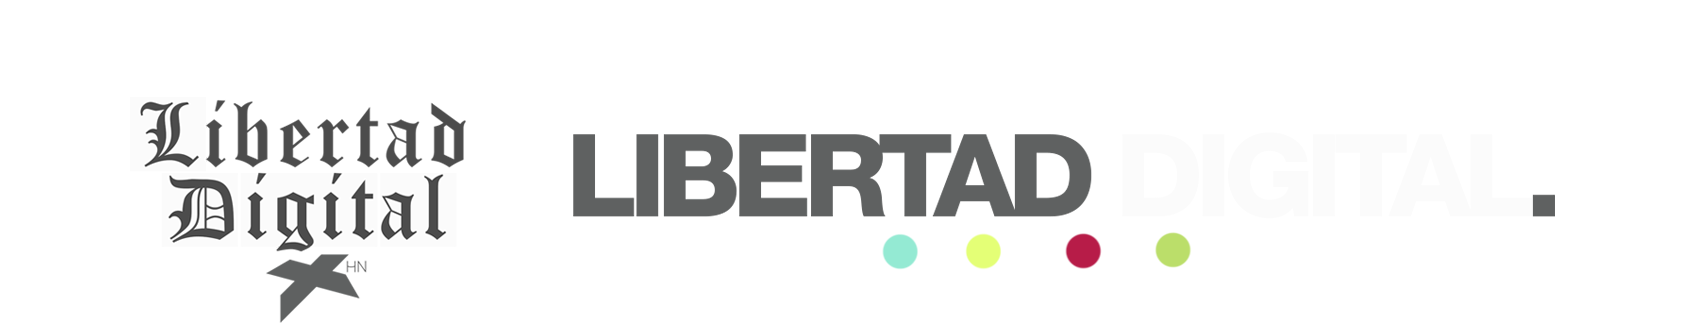 Libertad Digital